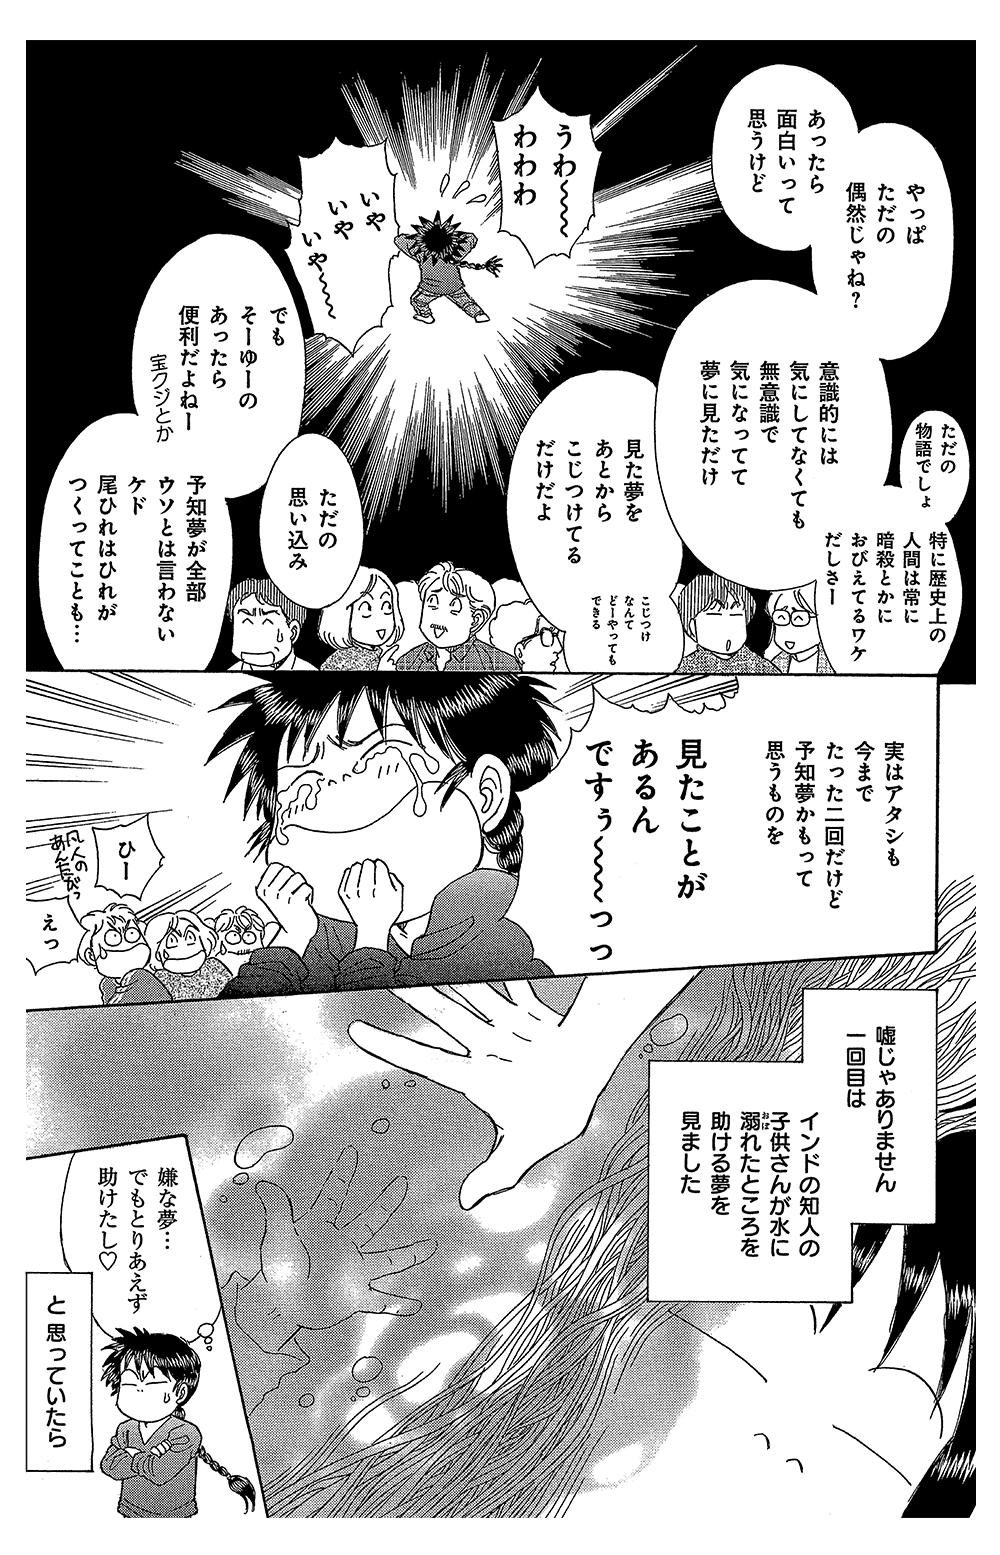 okaruto2-1-5.jpg